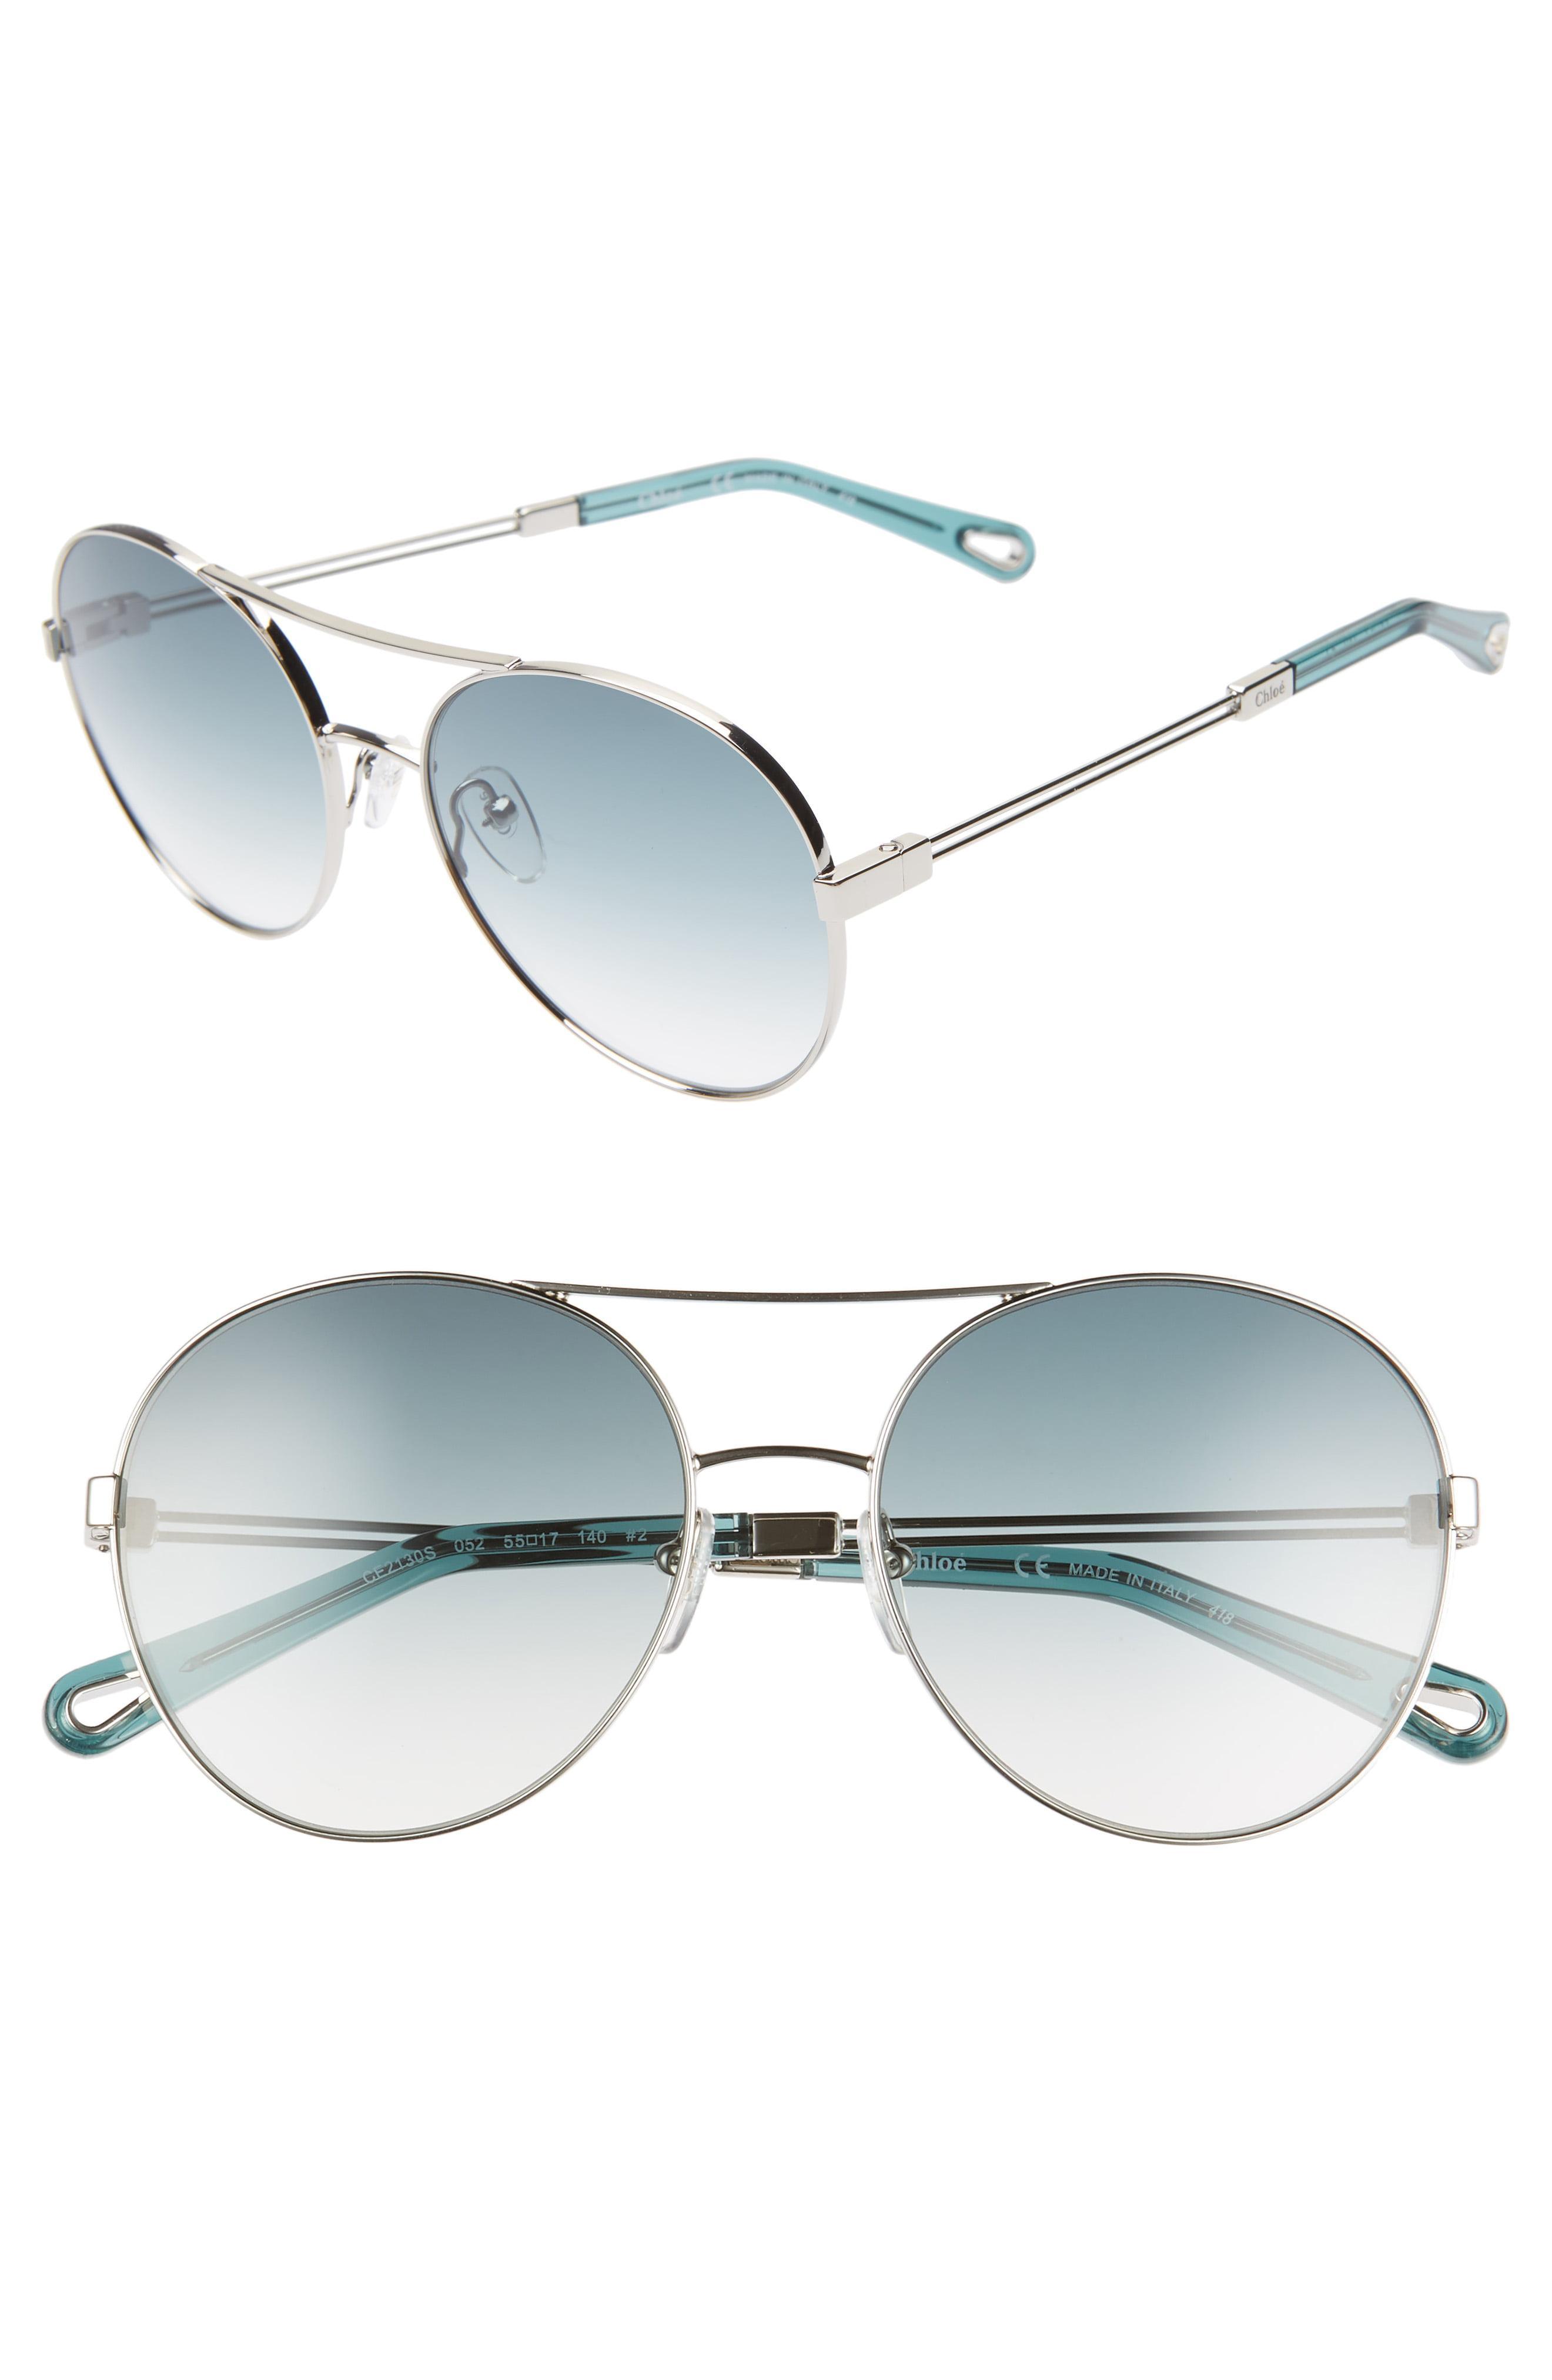 df2fc3ceca00 Lyst - Chloé Jacky 55mm Gradient Aviator Sunglasses in Metallic